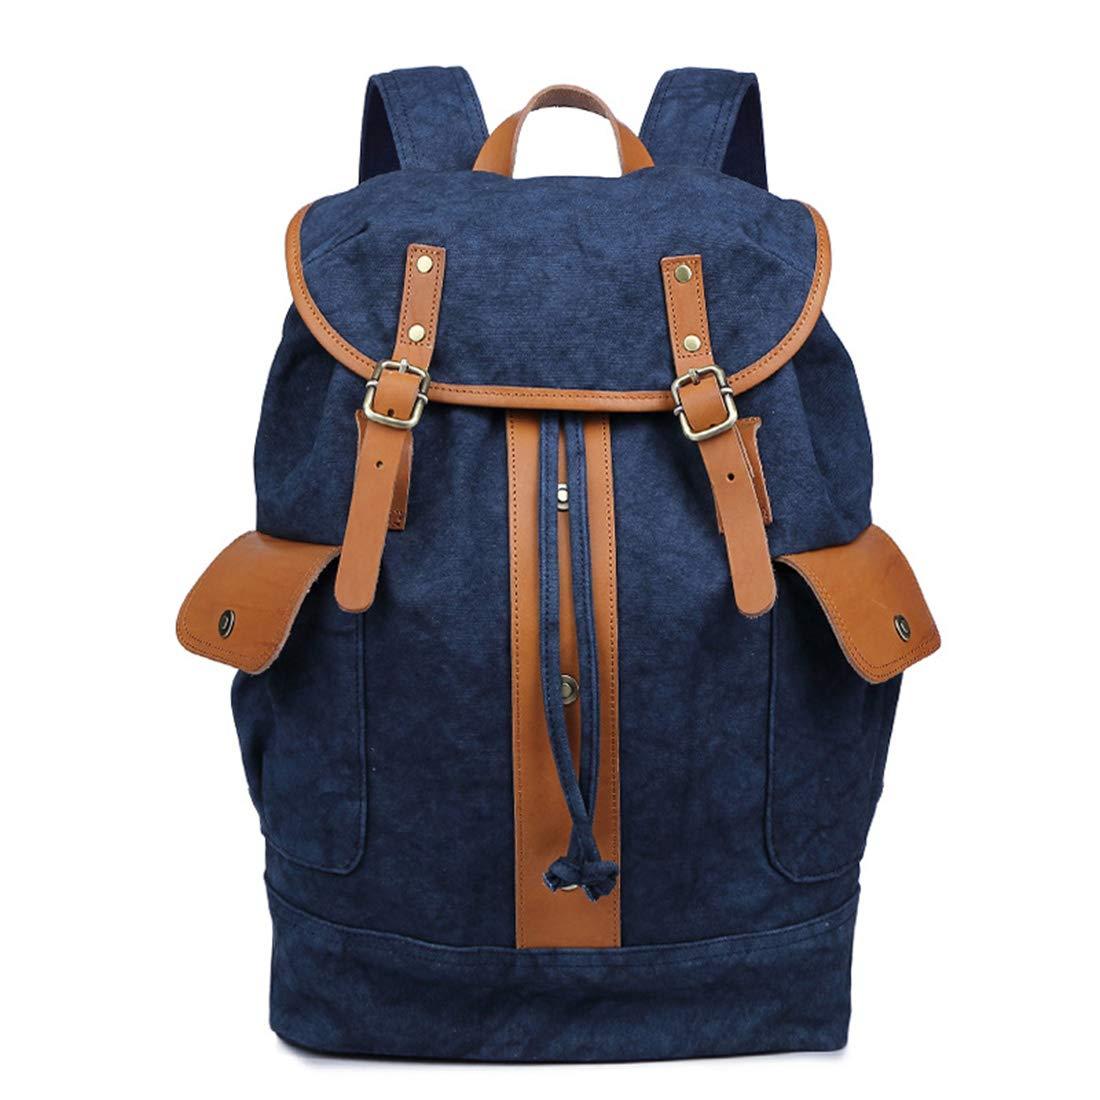 CAFUTY メンズ/レディースバックパックデイパック防水ヴィンテージ巾着キャンバス旅行学生アウトドアショッピング (Color : ブルー)  ブルー B07PT9VXLH